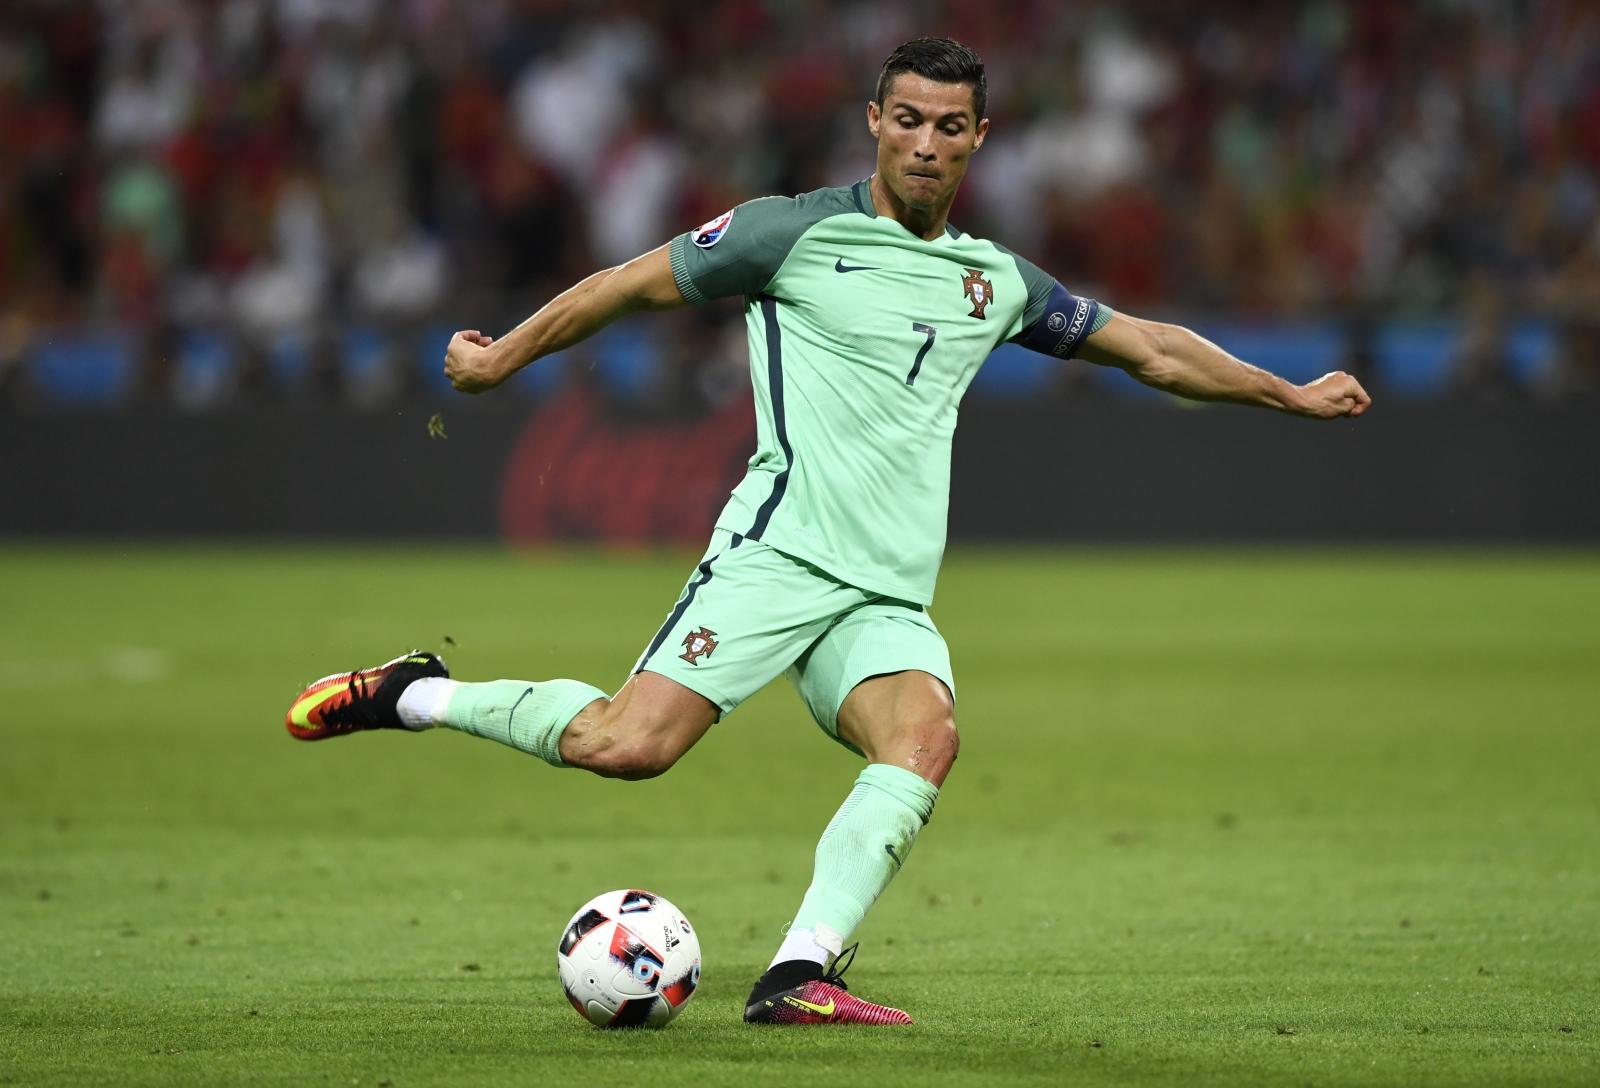 Ronaldo shoots at goal